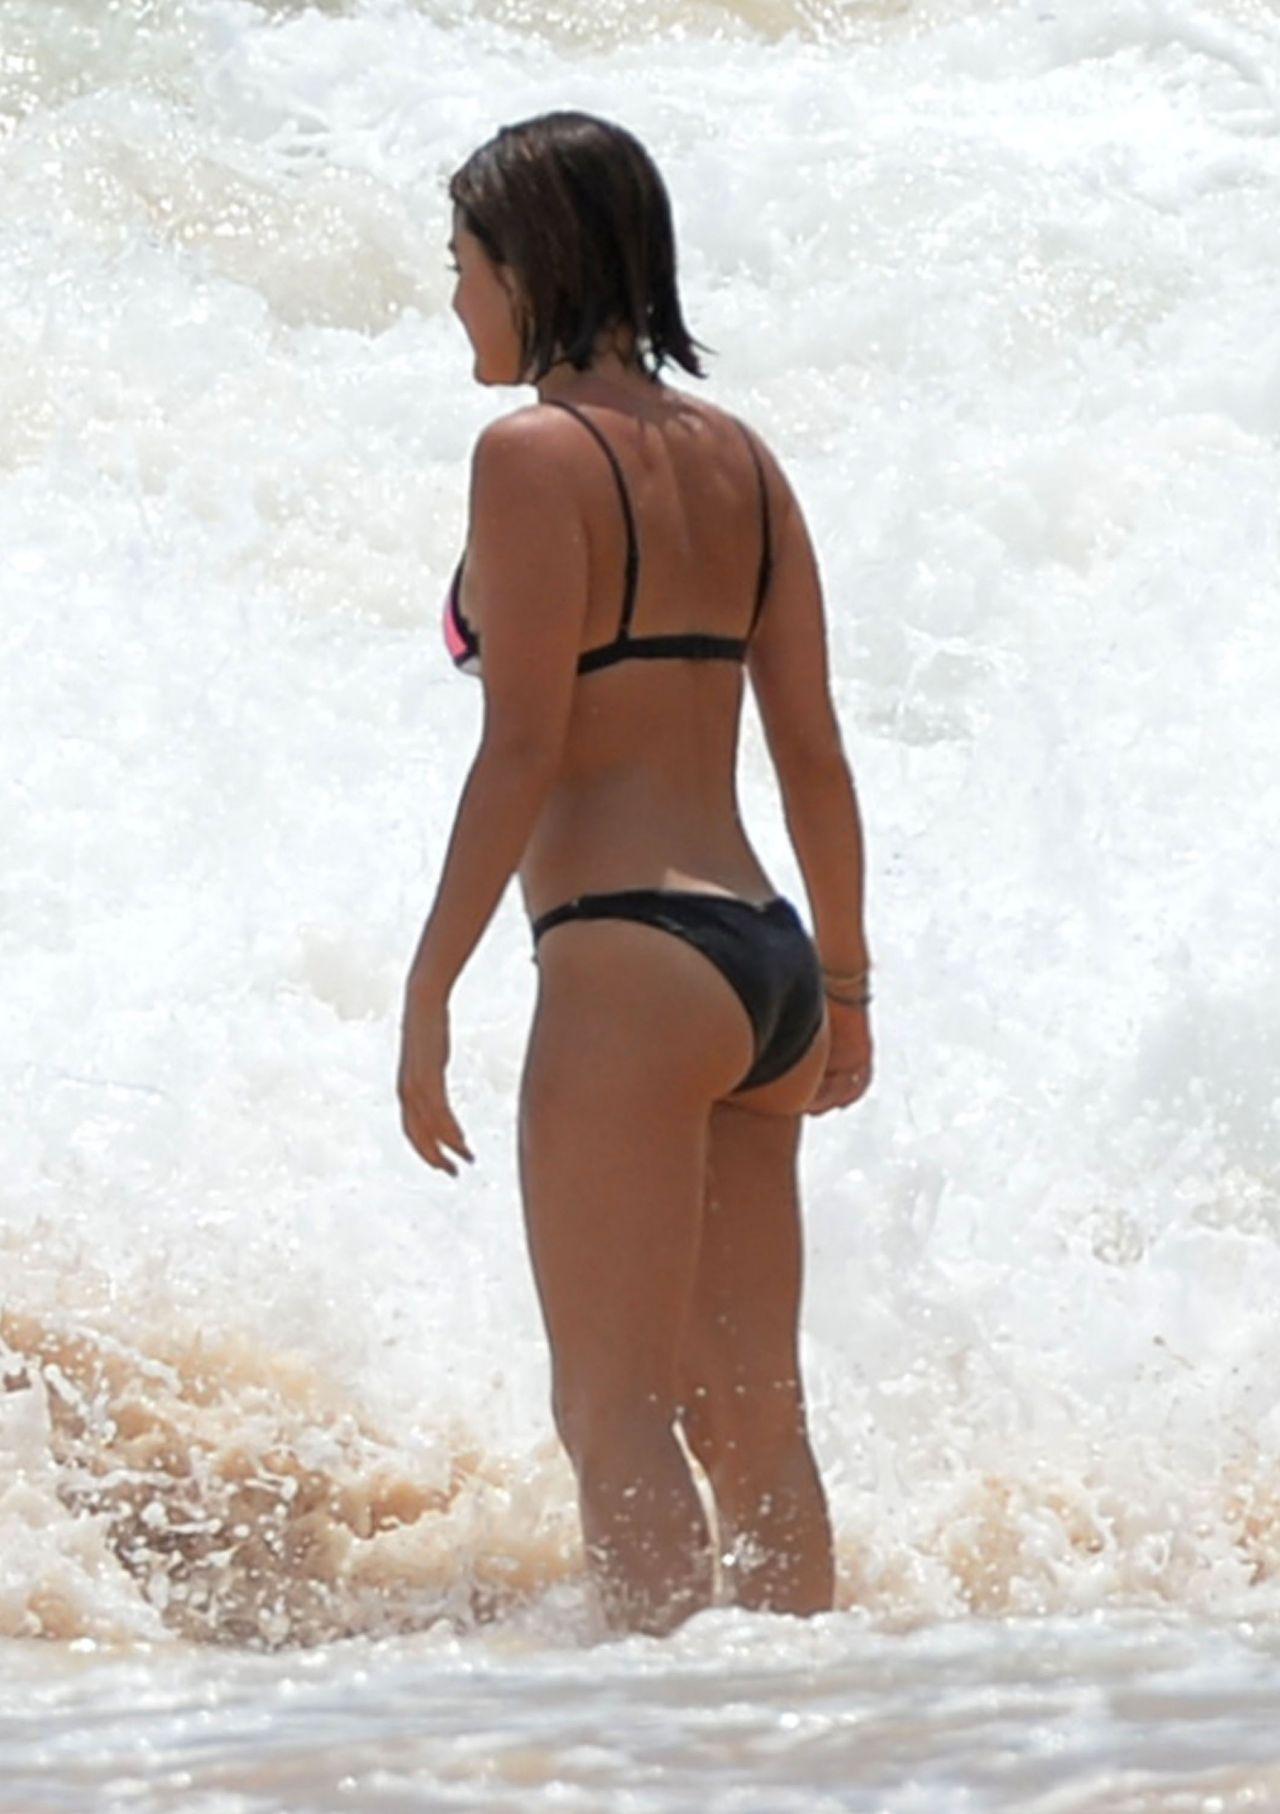 Lucy Hale Bikini Pics At A Beach In Hawaii July 2015